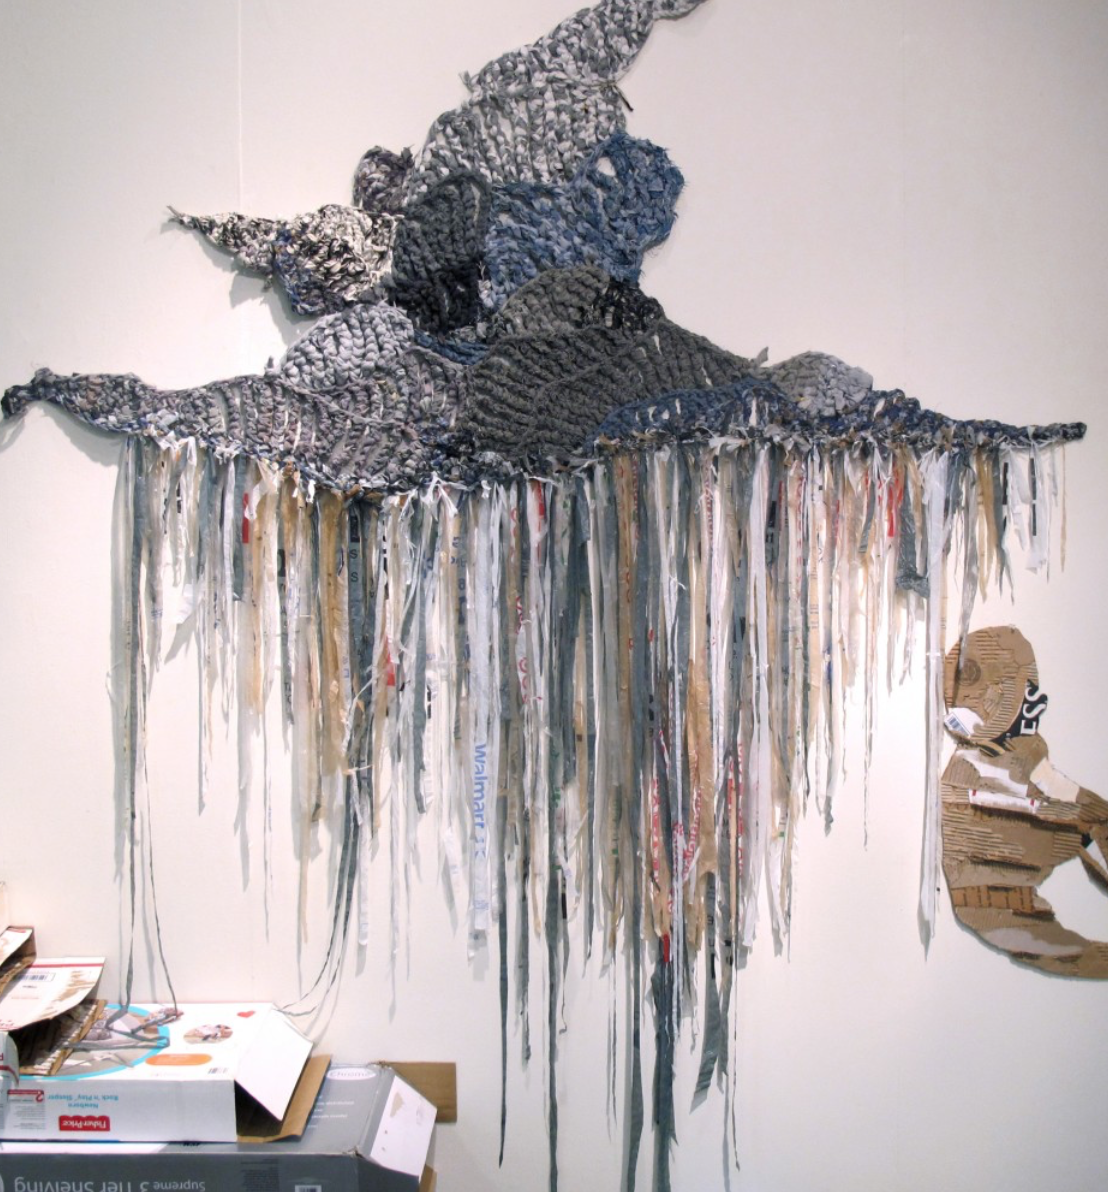 crochet art by Hannah Sanders